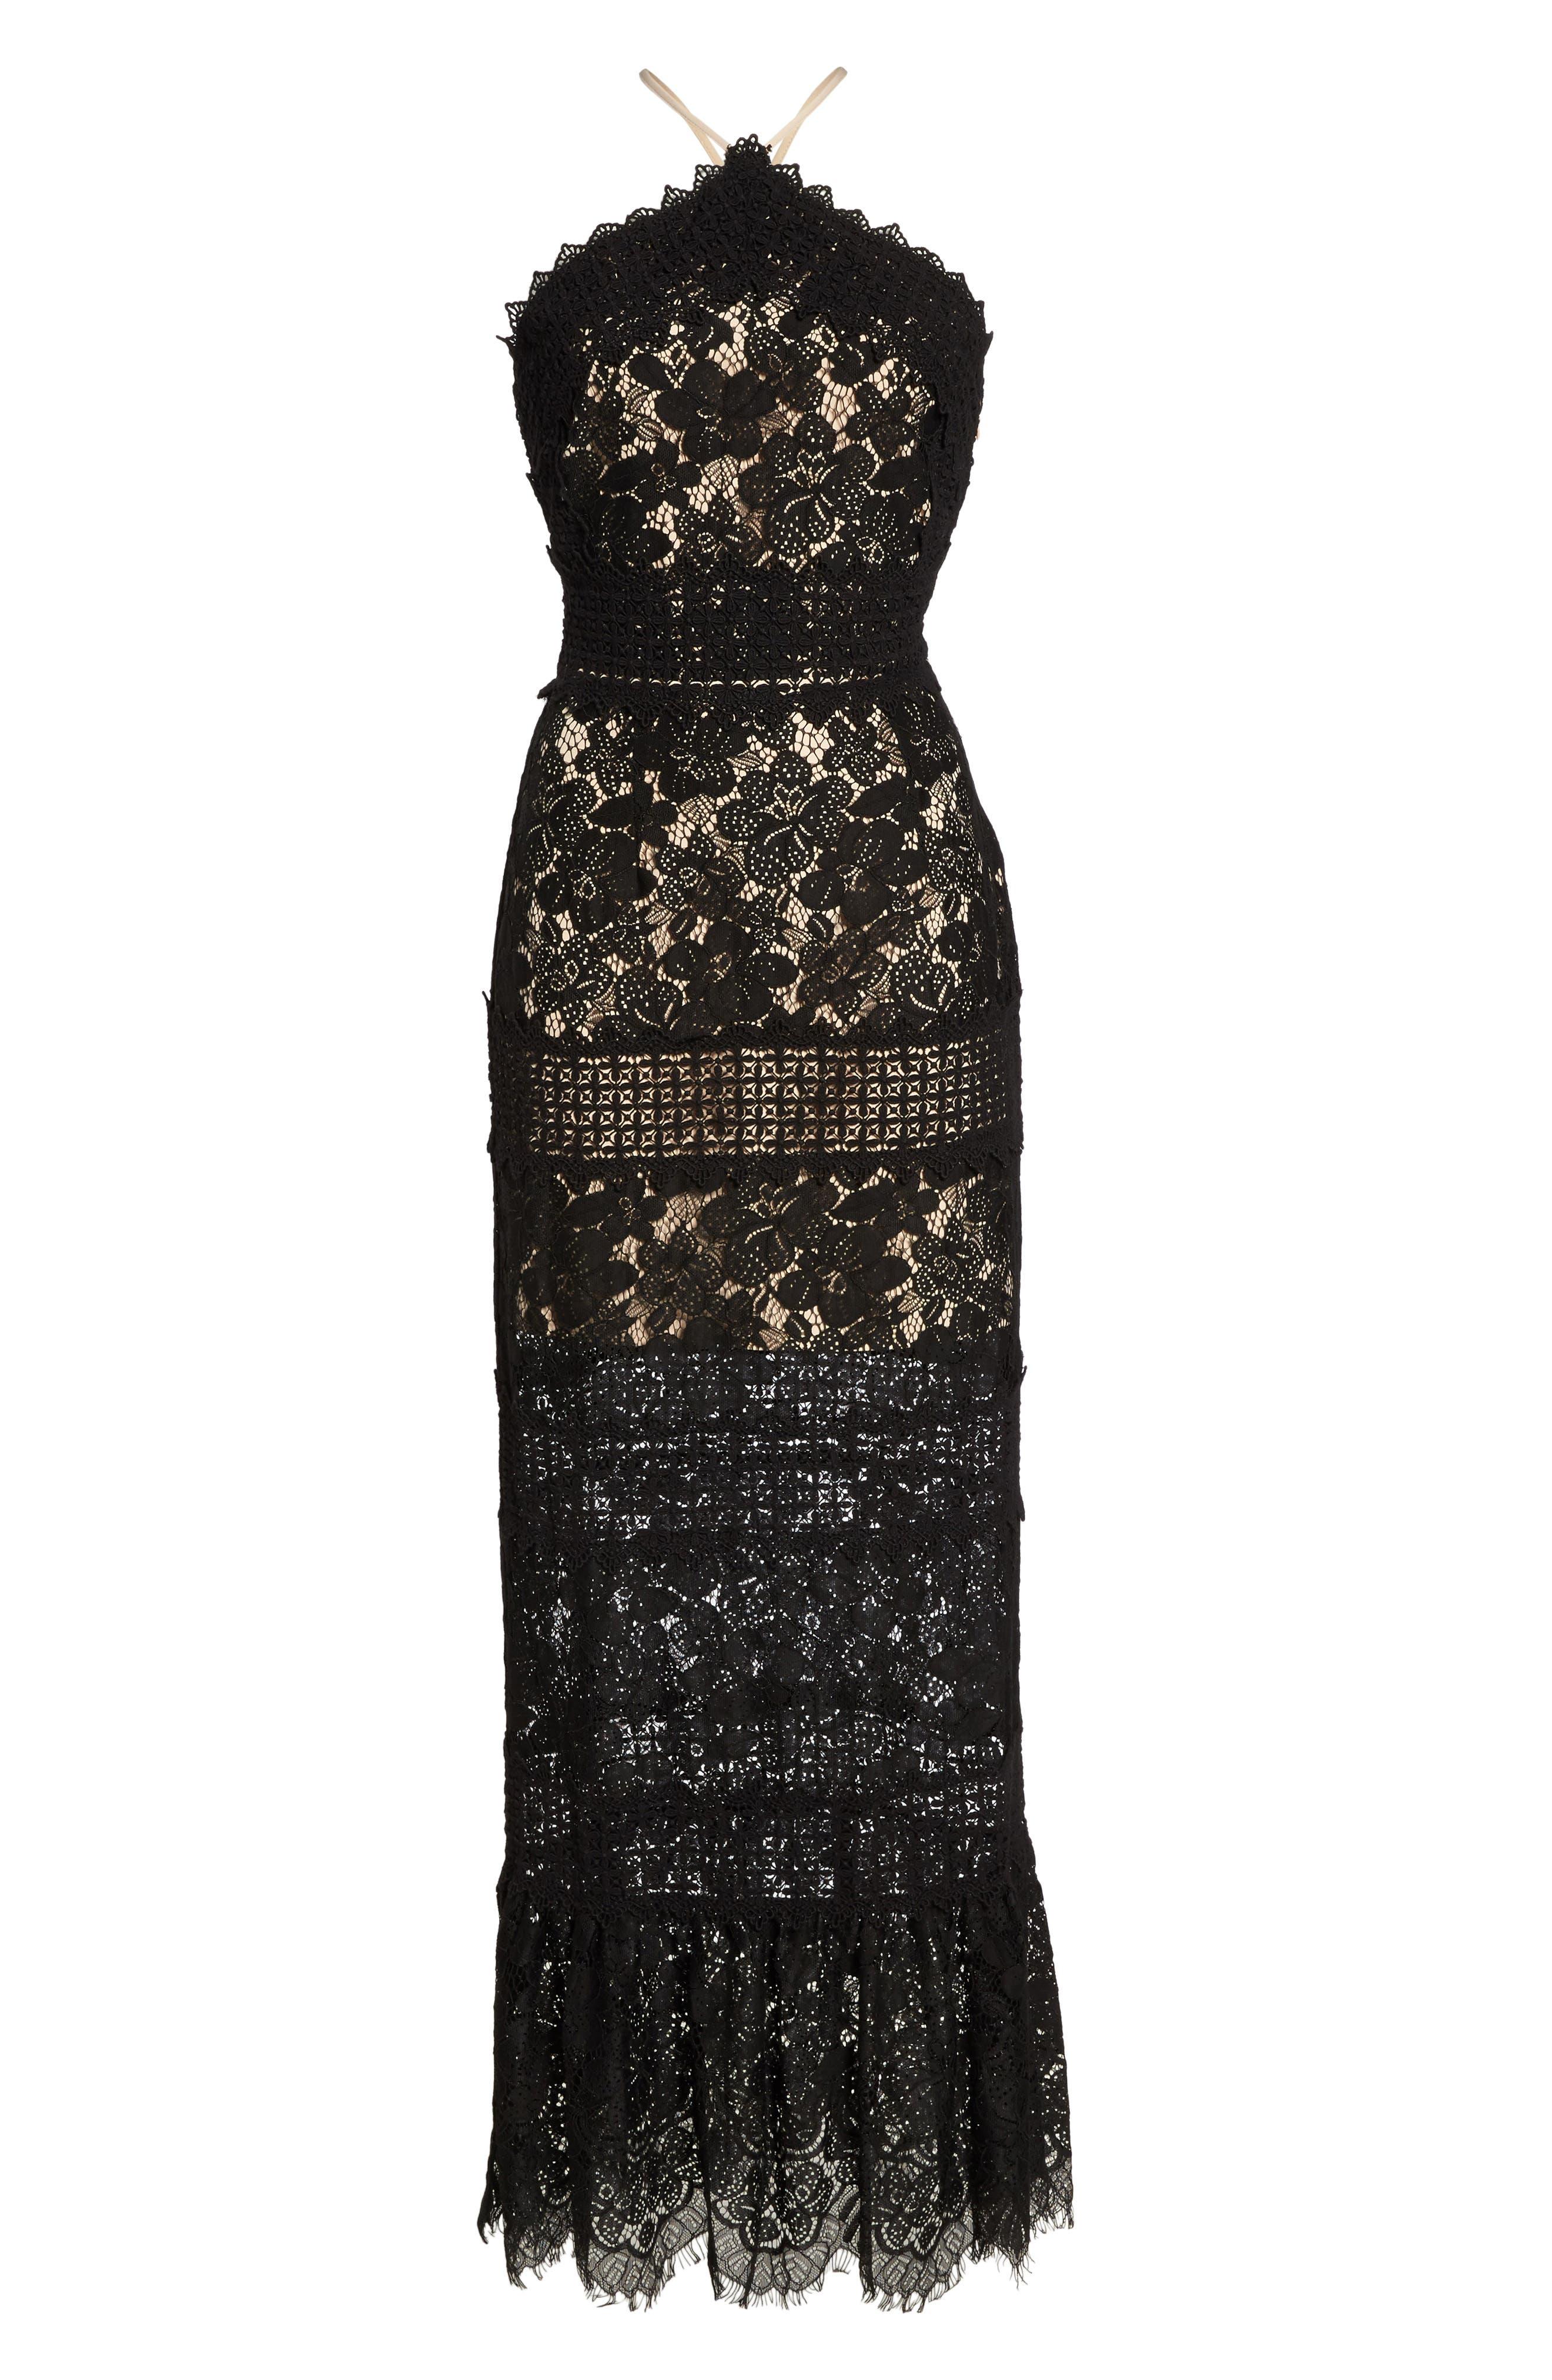 Tabitha Lace Maxi Dress,                             Alternate thumbnail 11, color,